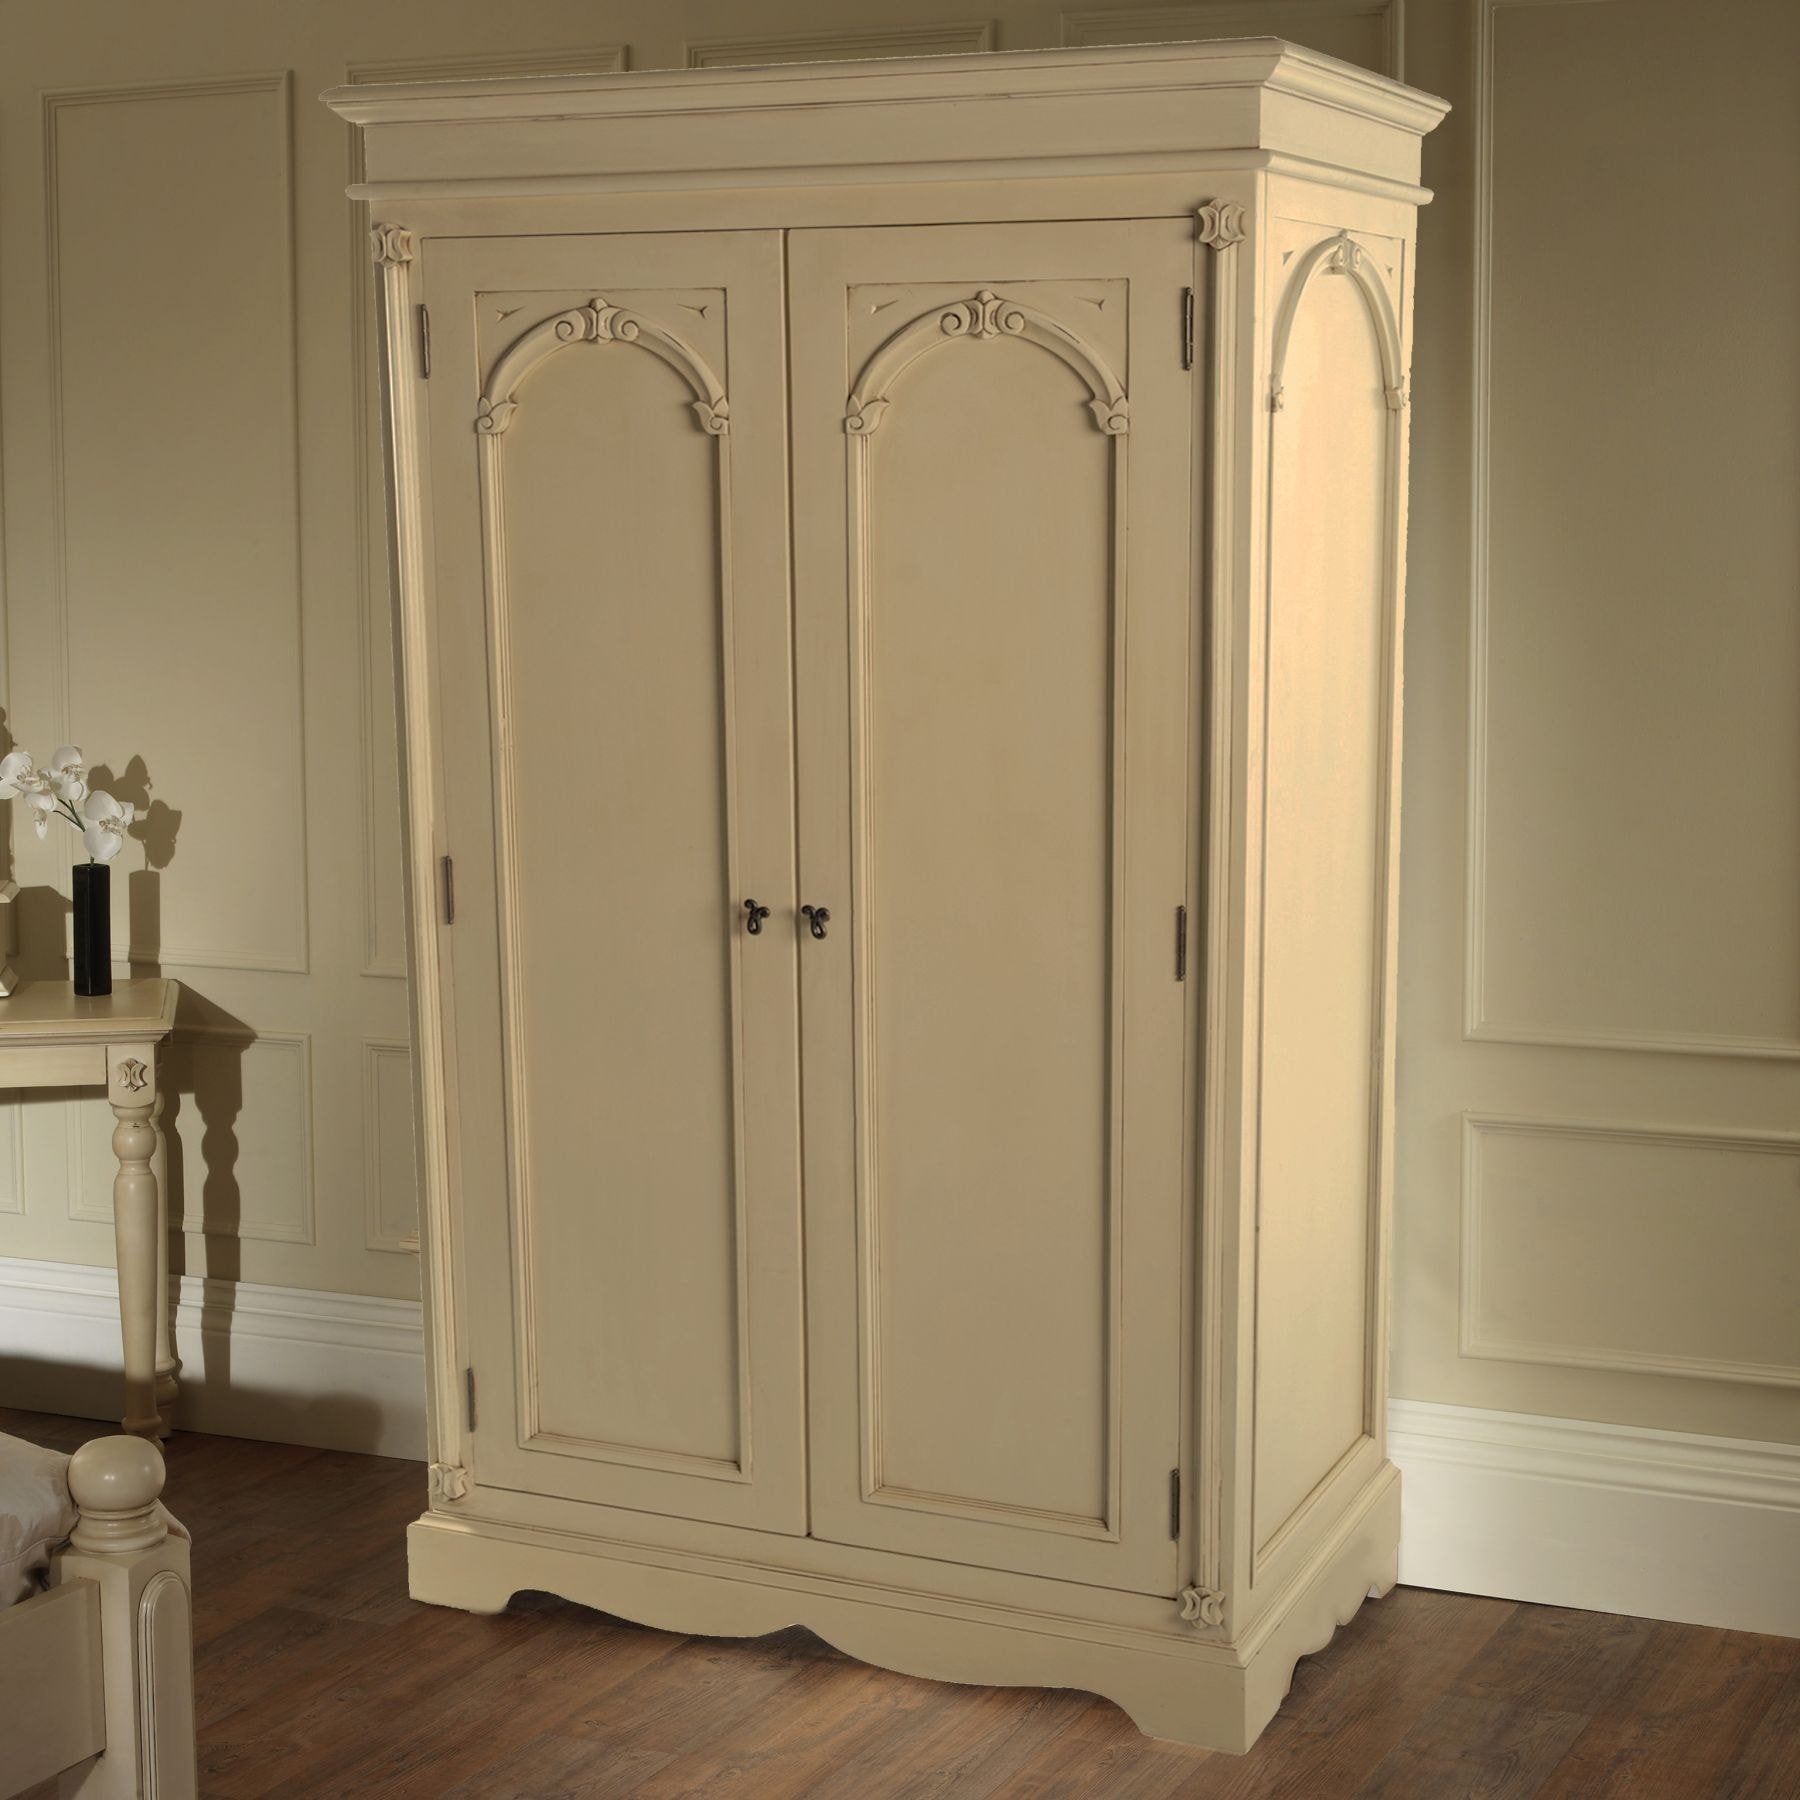 victorian antique french wardrobe working well alongside. Black Bedroom Furniture Sets. Home Design Ideas